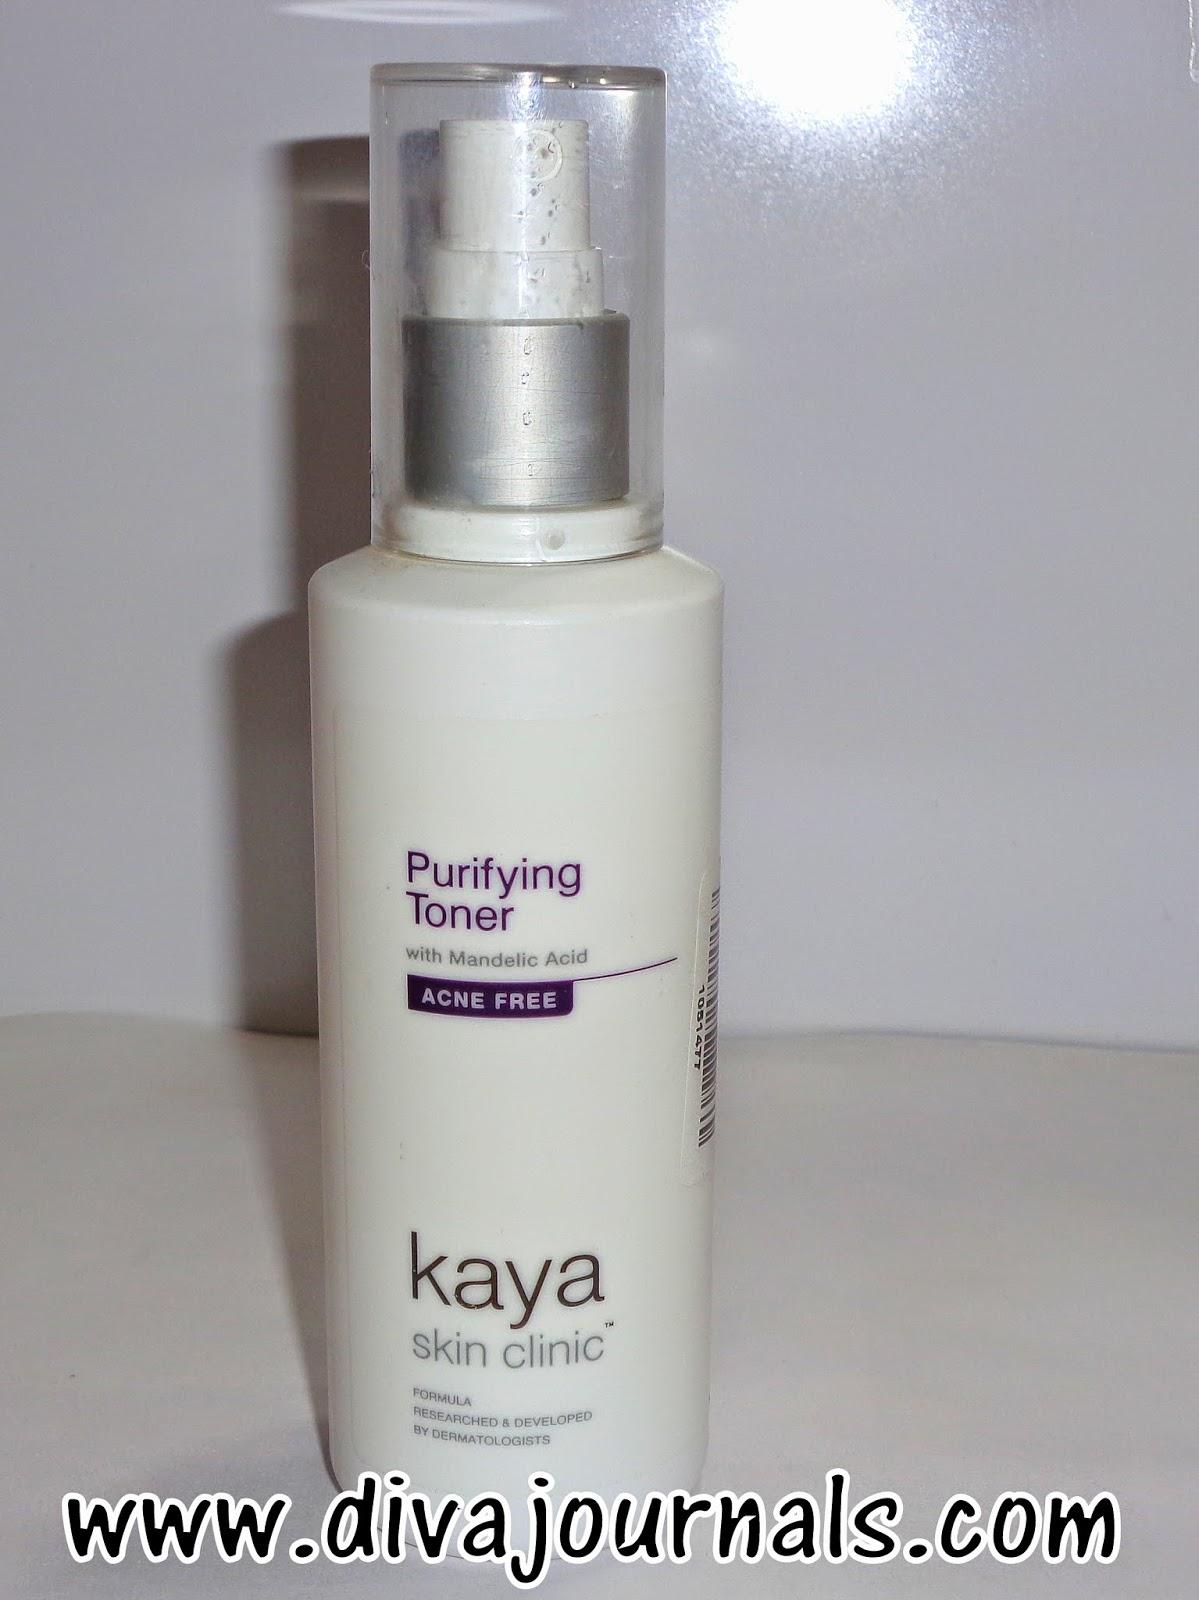 Kaya Acne-free Purifying Toner Review